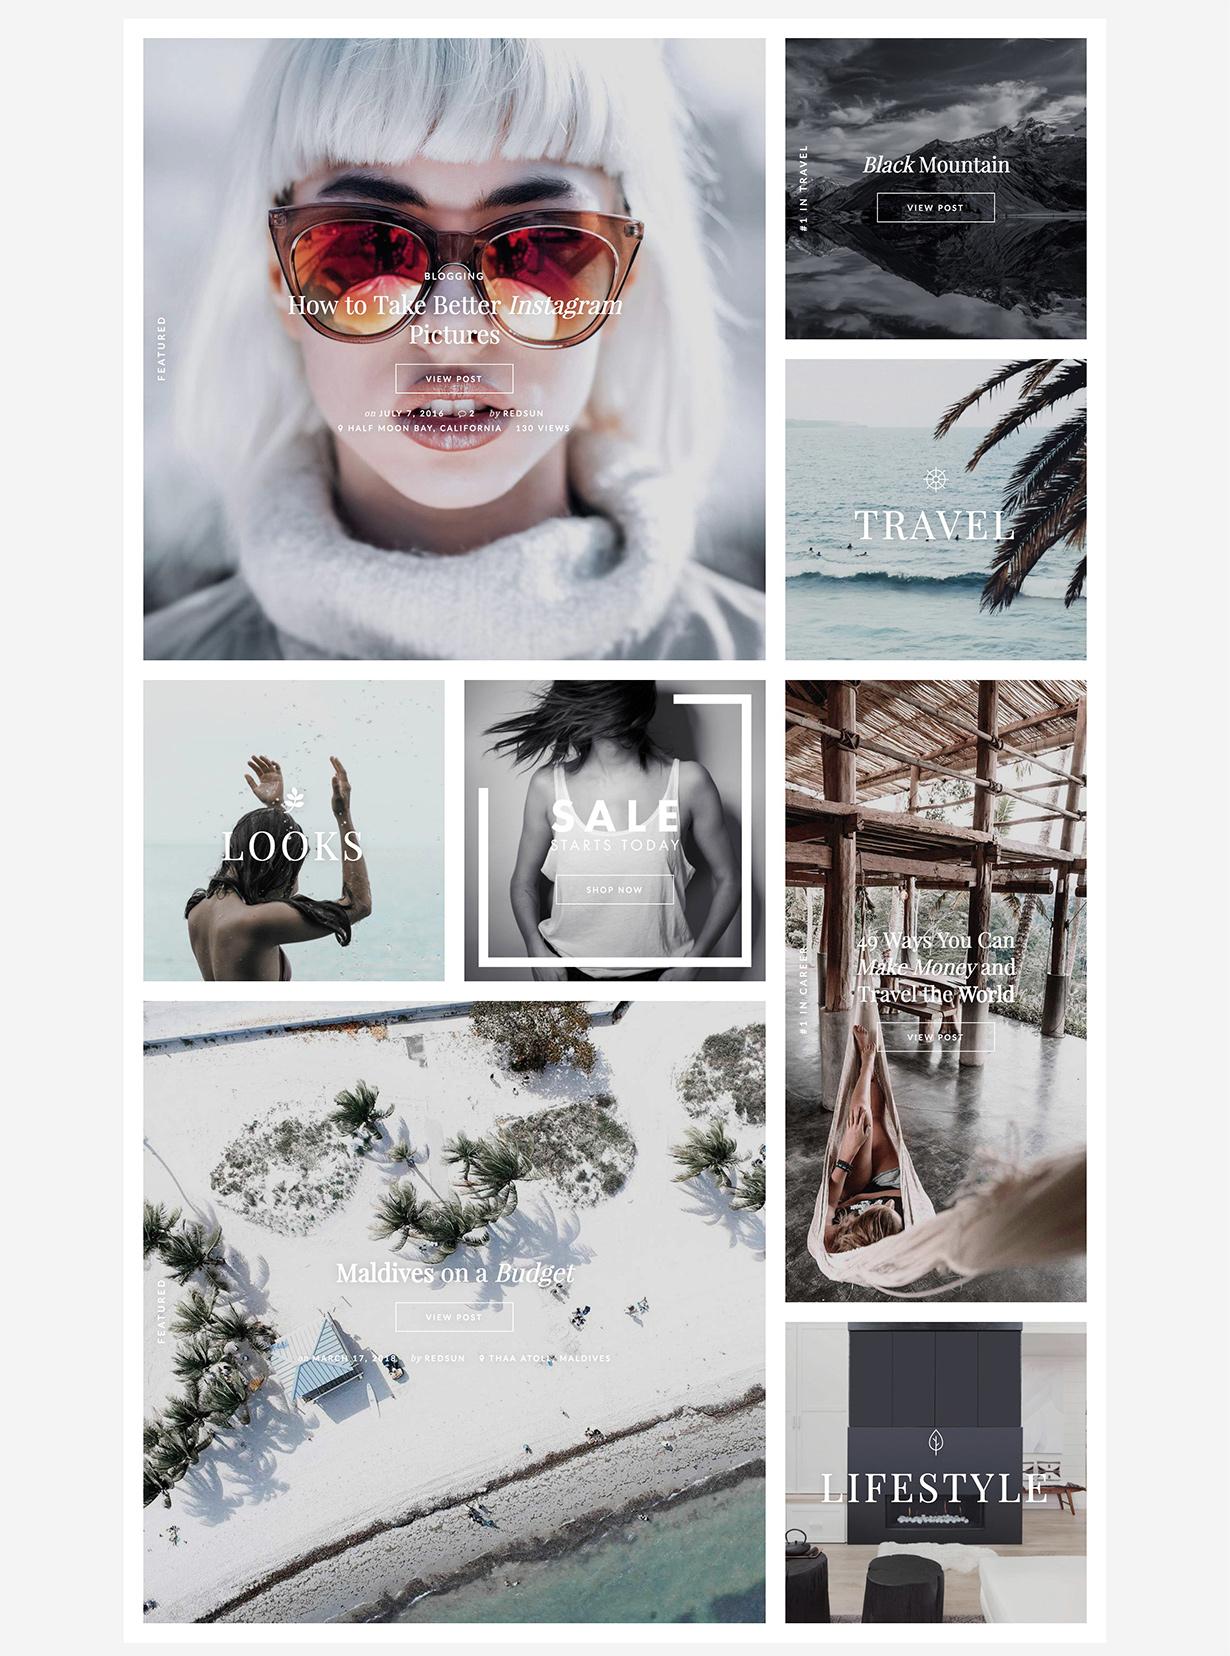 Marni – a WordPress Blog & Shop Theme - 2